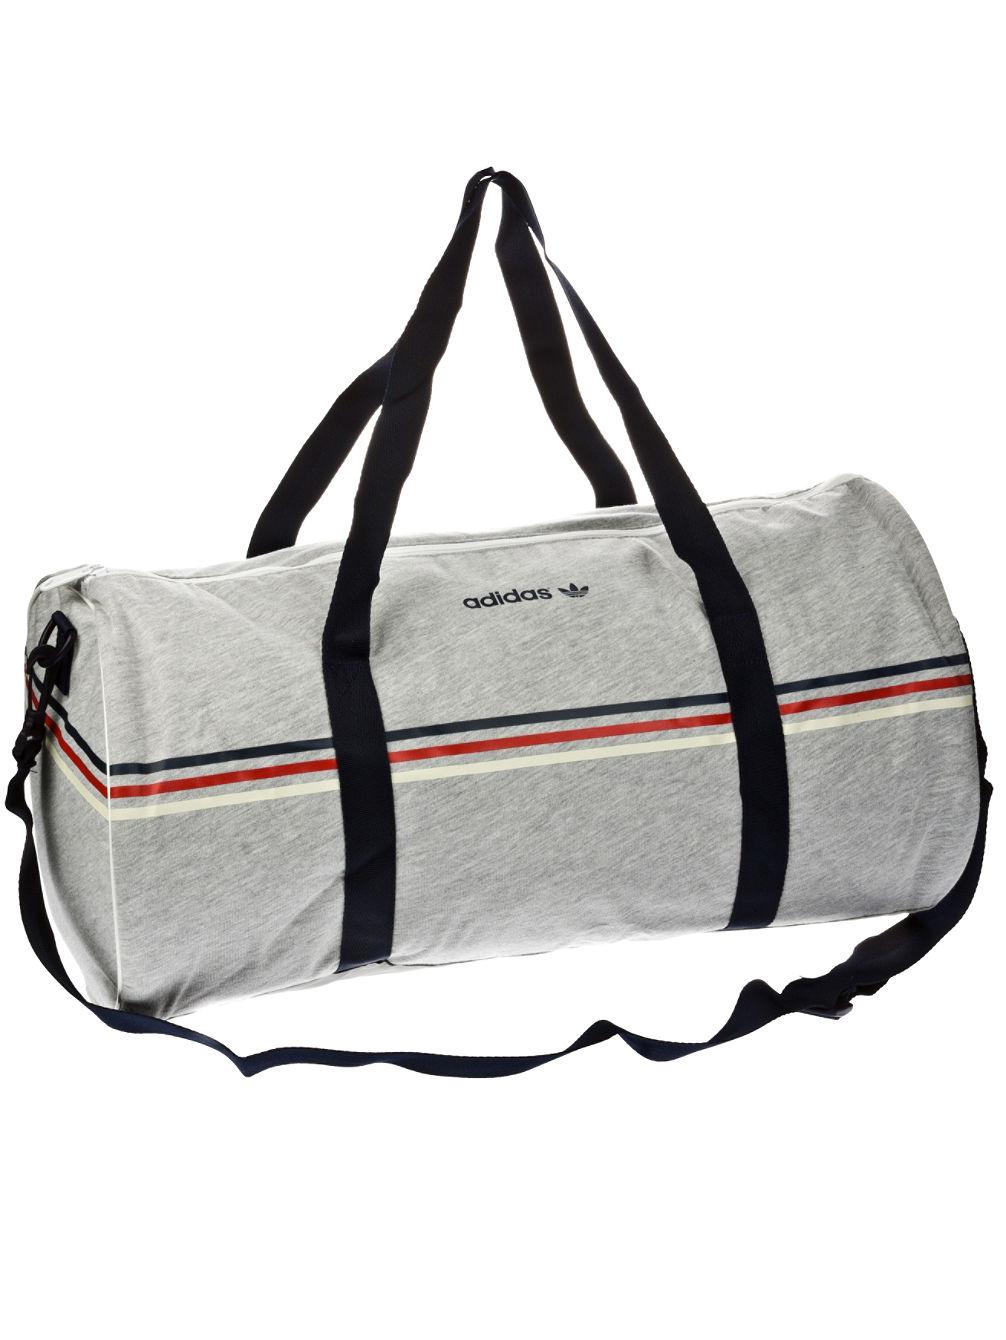 035d8a1f124 Buy adidas Originals AC Duffle L Jersey Bag online at Blue Tomato